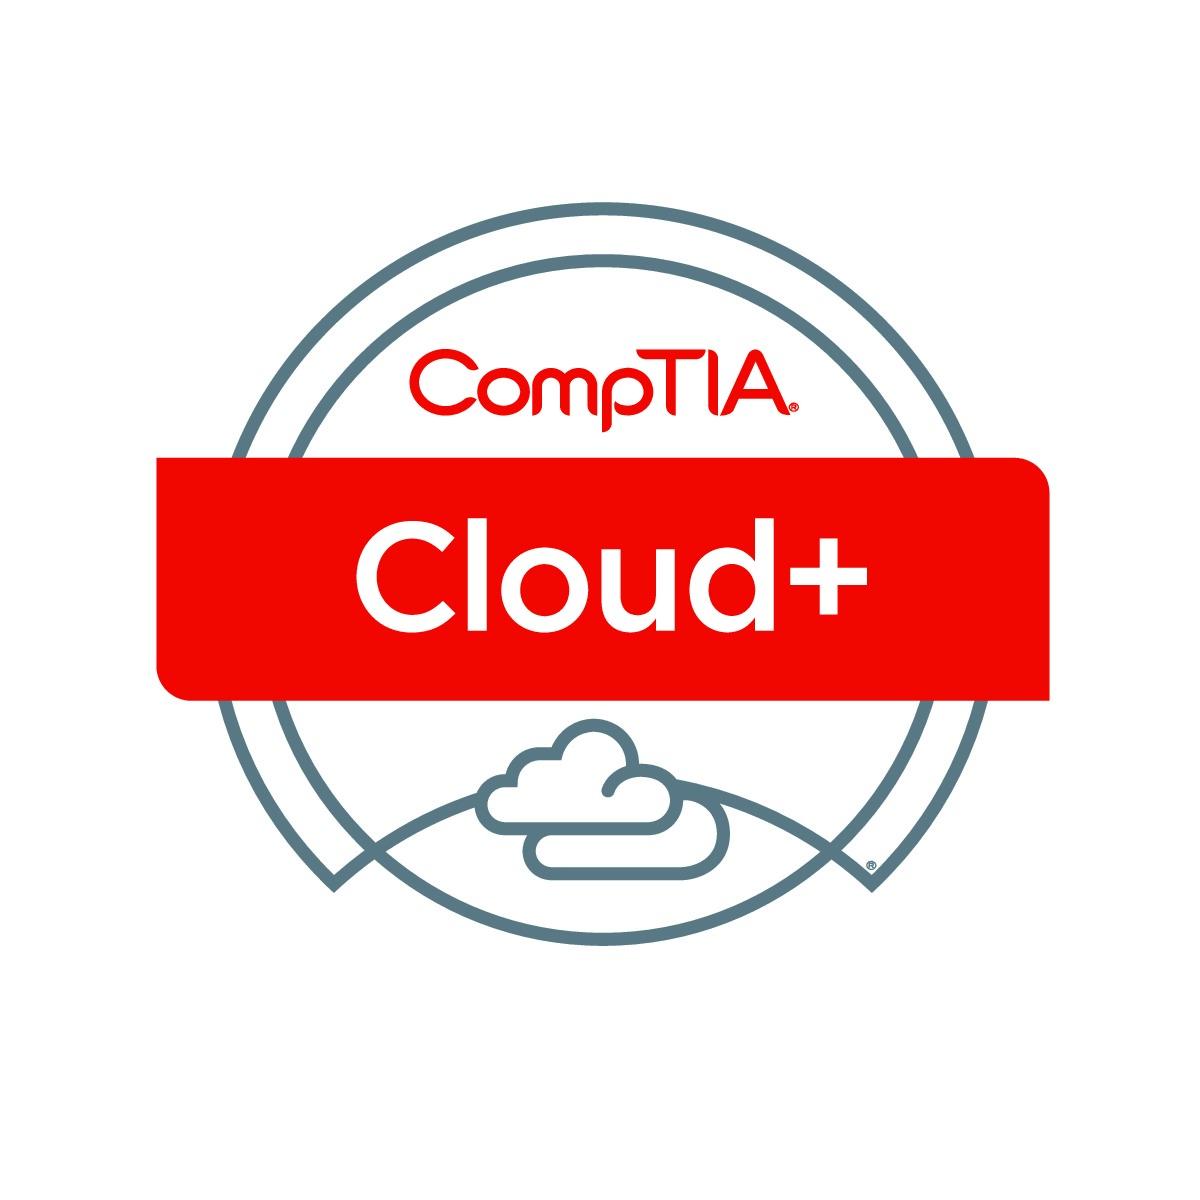 CompTIA Cloud Plus Logo